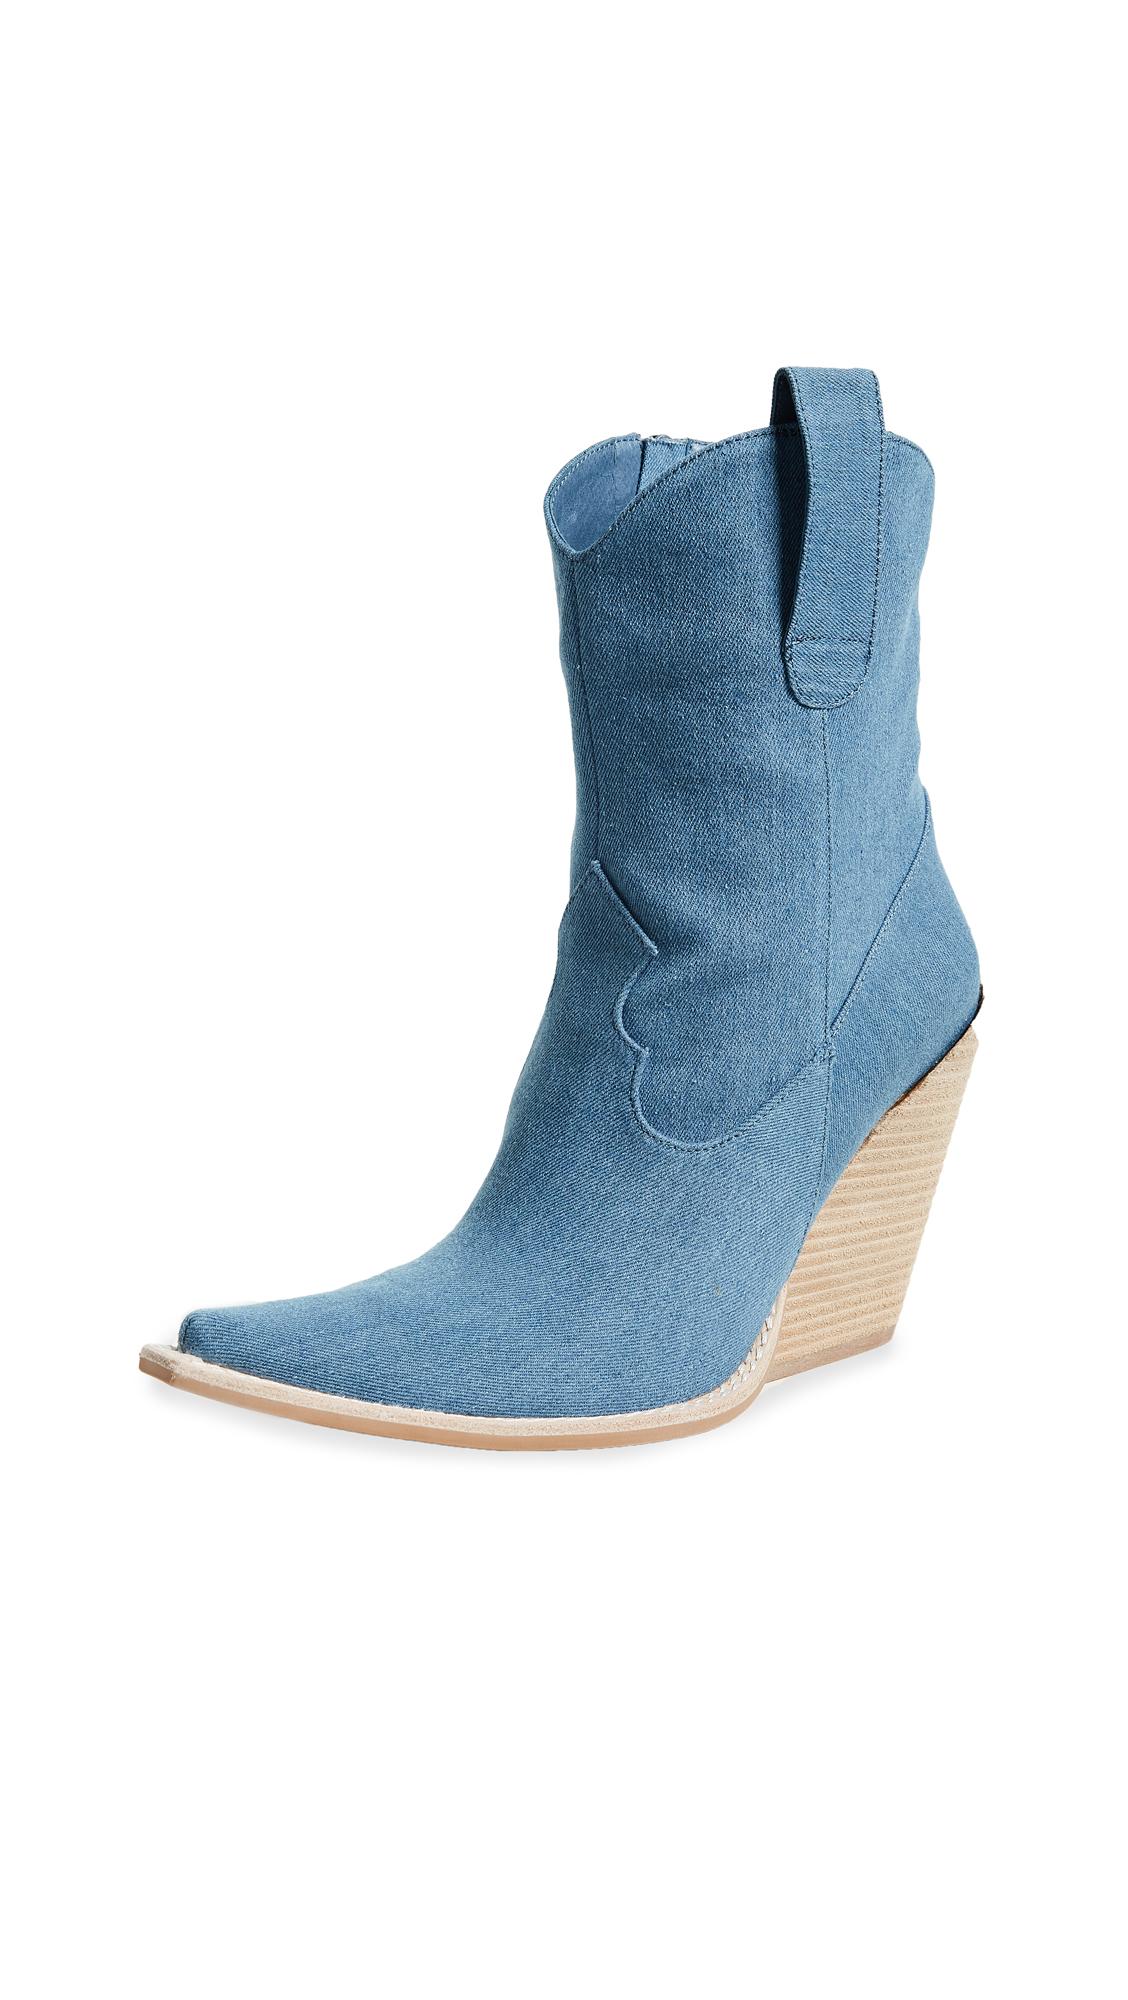 Jeffrey Campbell Homage Point Toe Boots - Denim